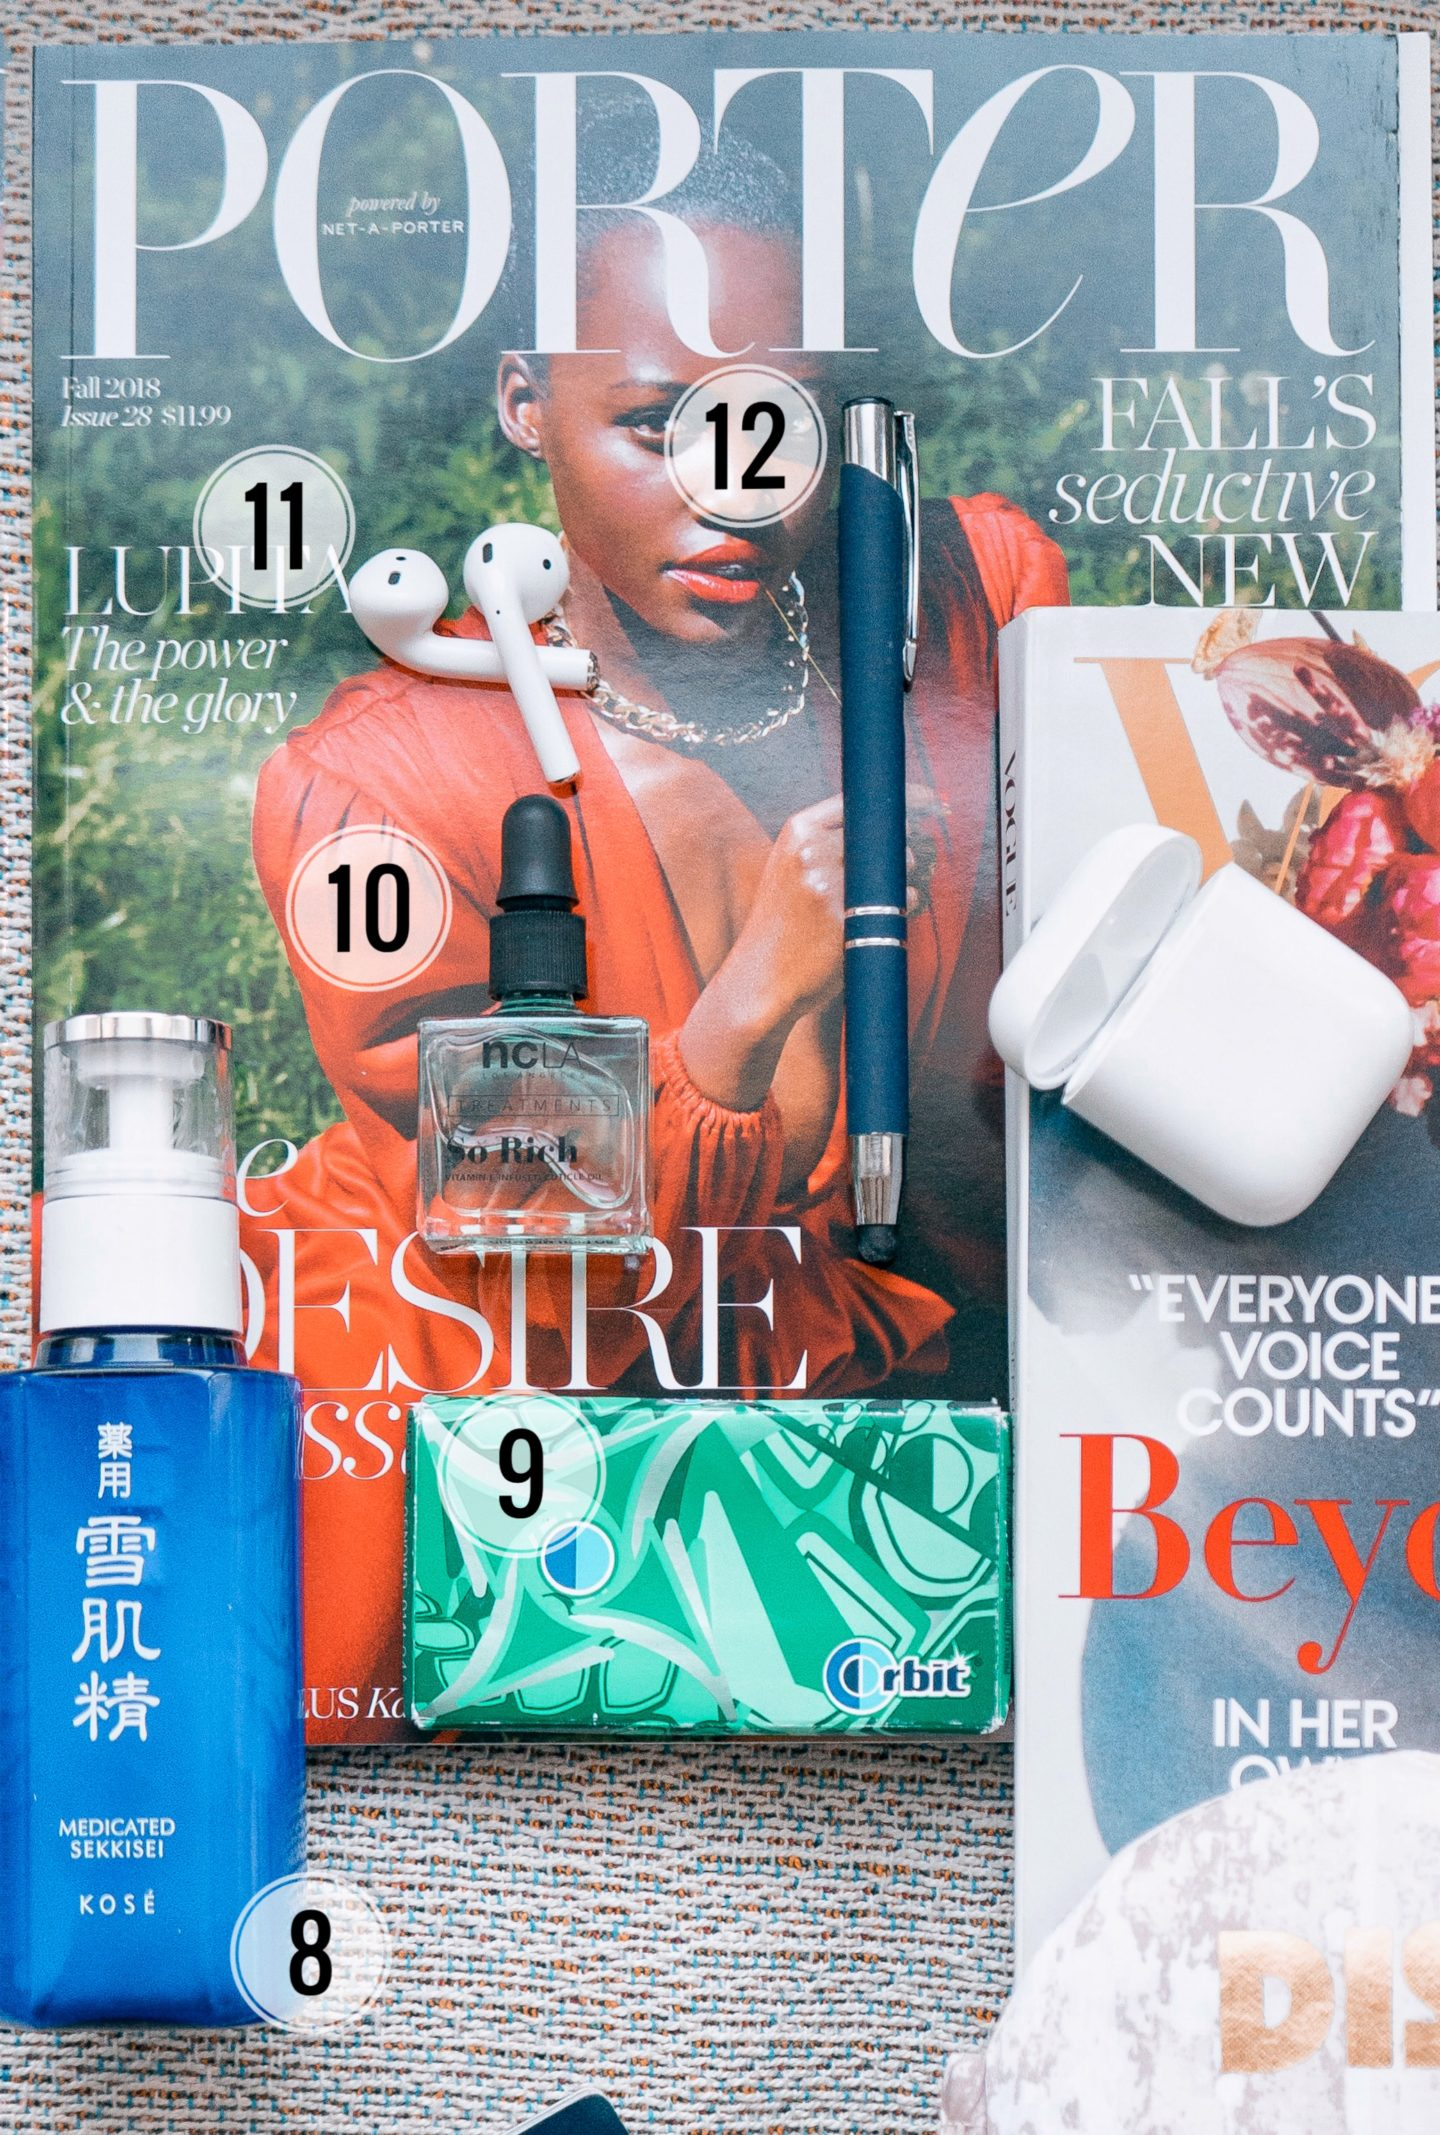 Porter magazine Lupita Nyongo, Kose Sekkisai Emulsion, Orbit gum, apple airpods, NCLA cuticle oil, in flight essentials